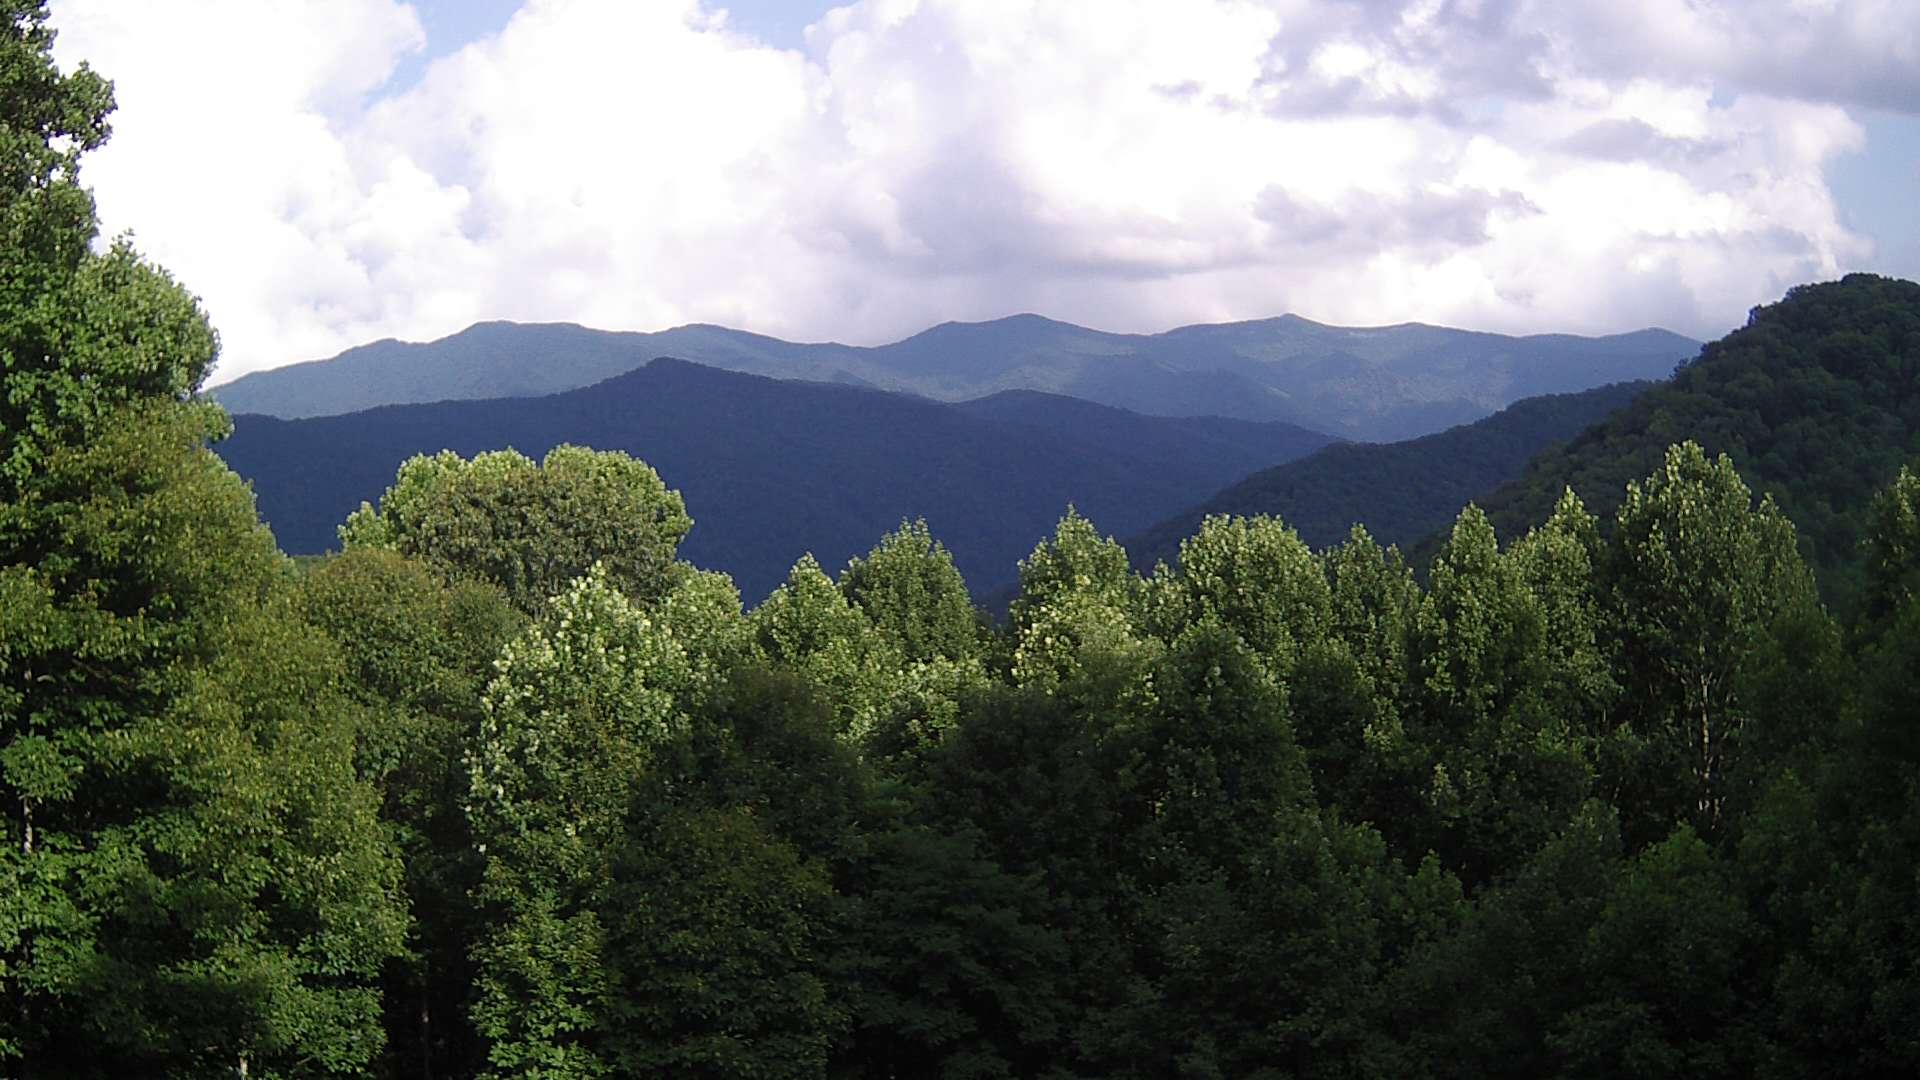 9) Pensacola NC, USA {1920 x 1080px} 3835ft